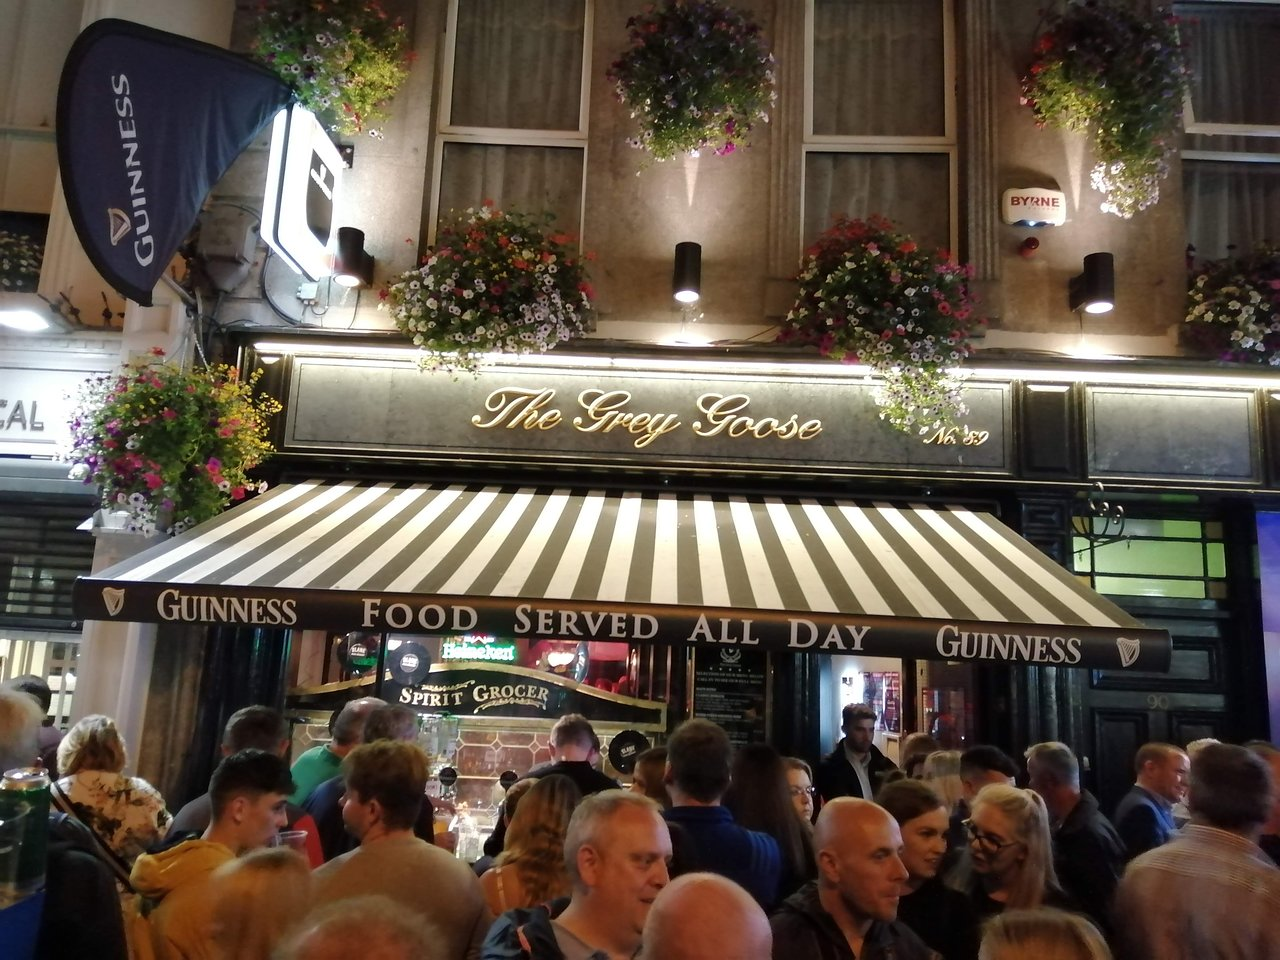 Events this weekend in Drogheda, Ireland - Eventbrite